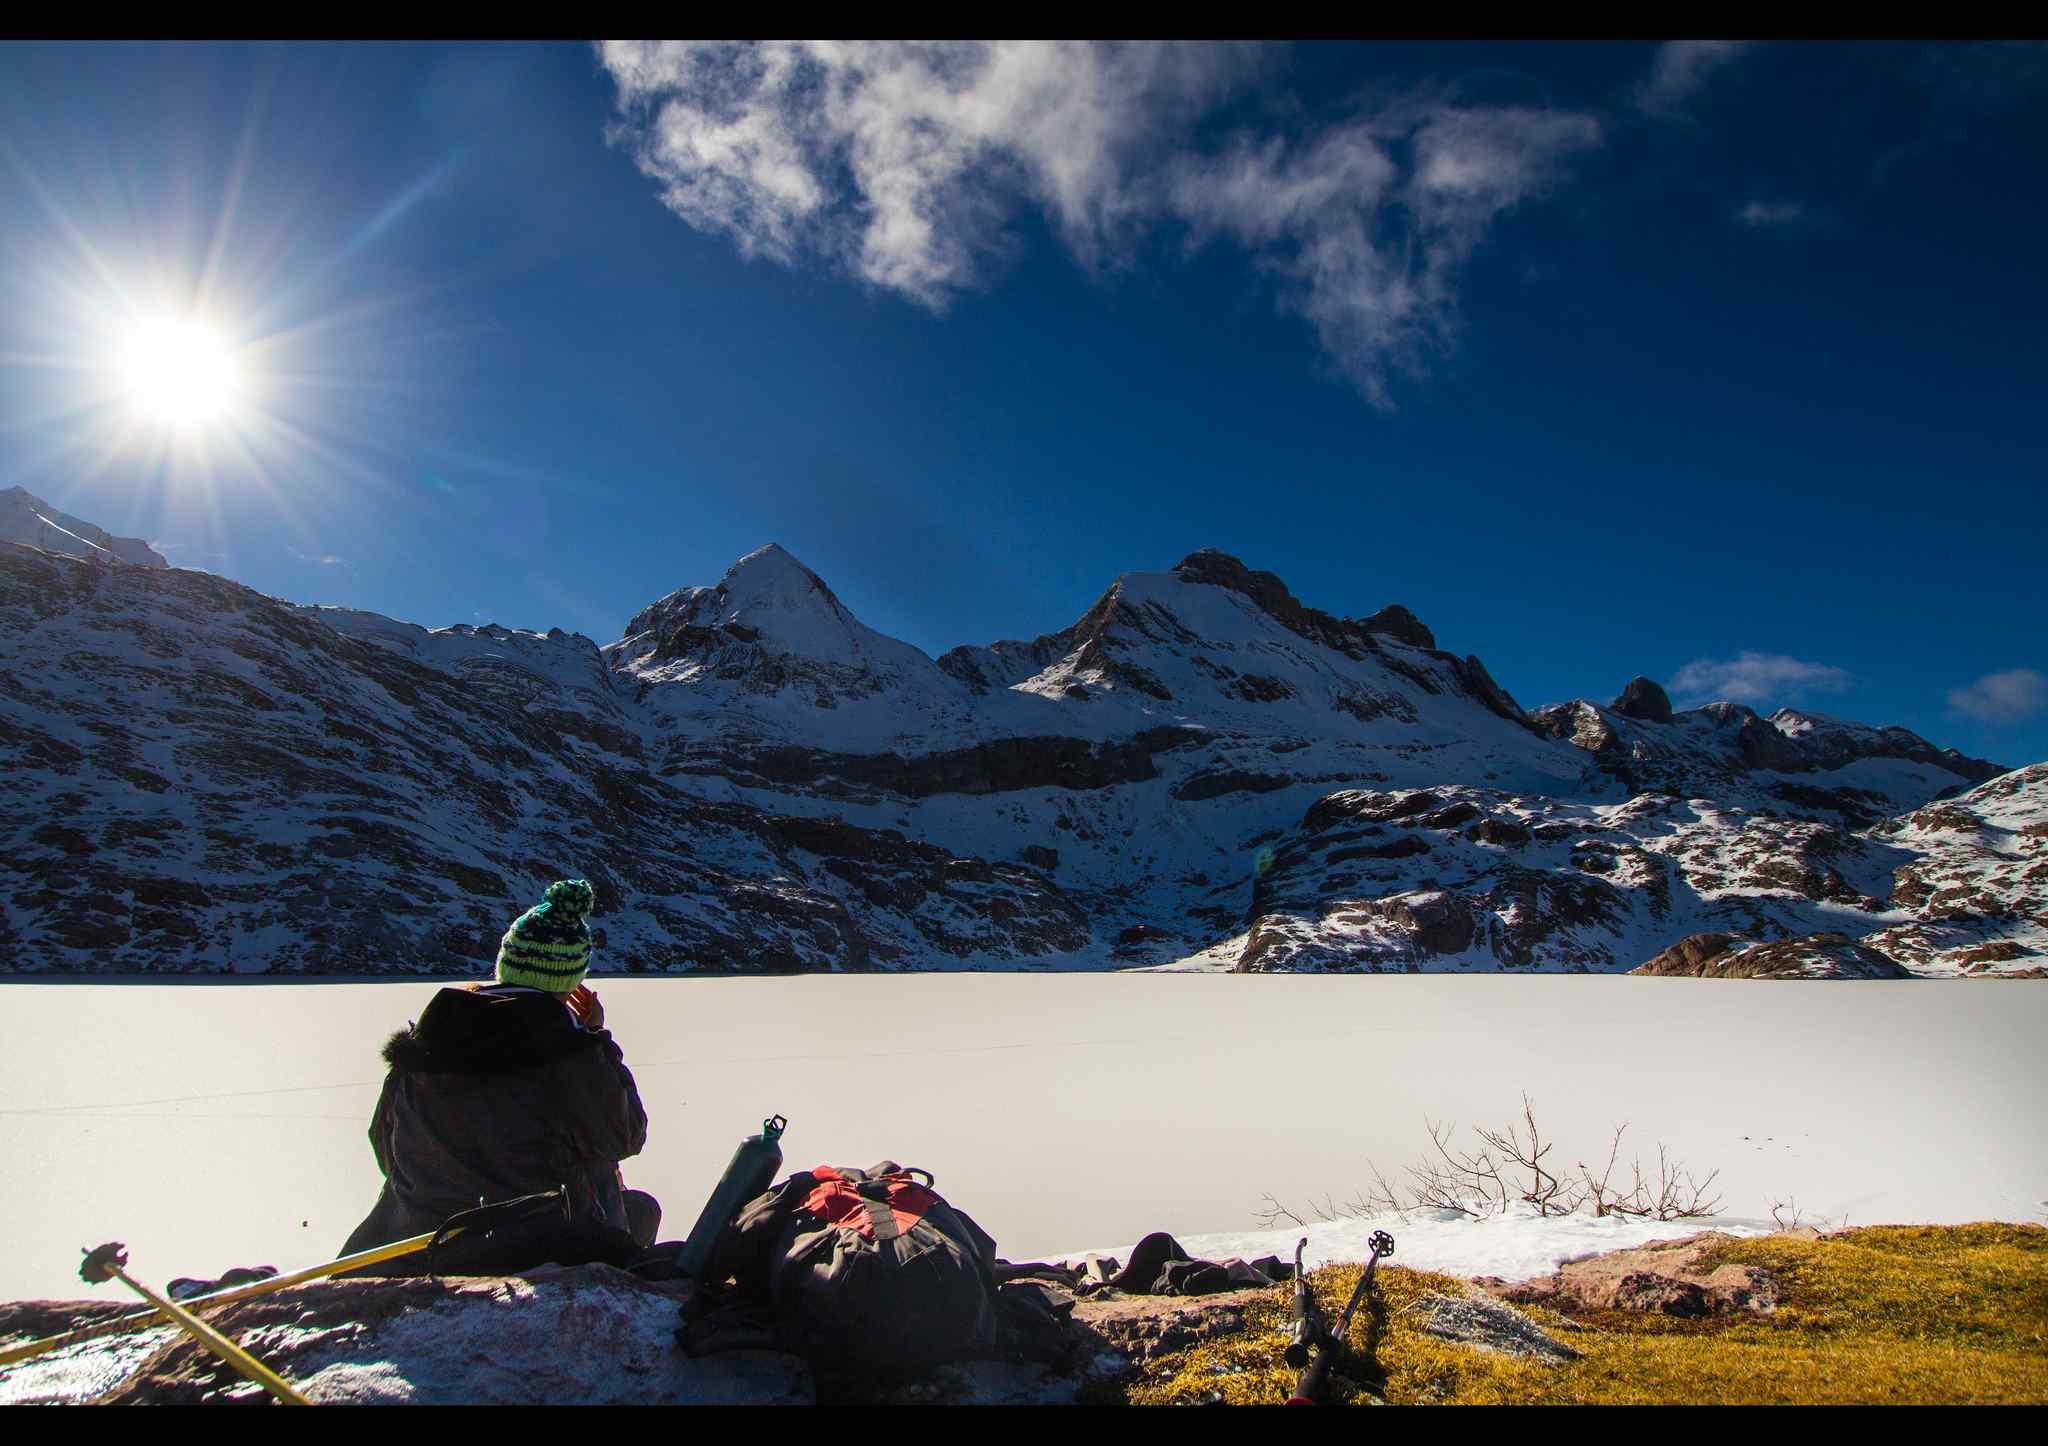 ❄️⛷ Tres destinos para practicar raquetas de nieve en Huesca